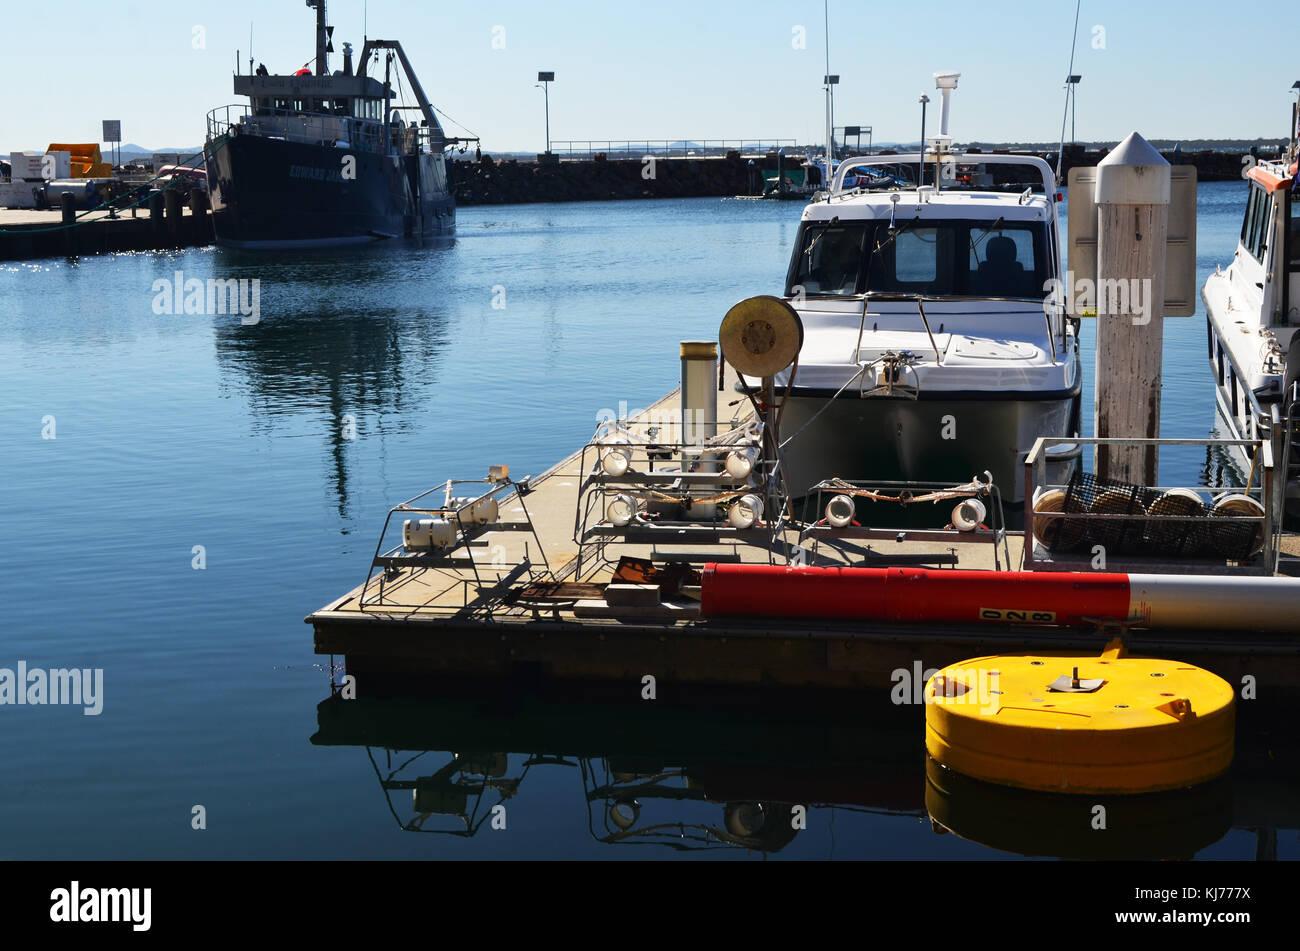 Port nelson nsw